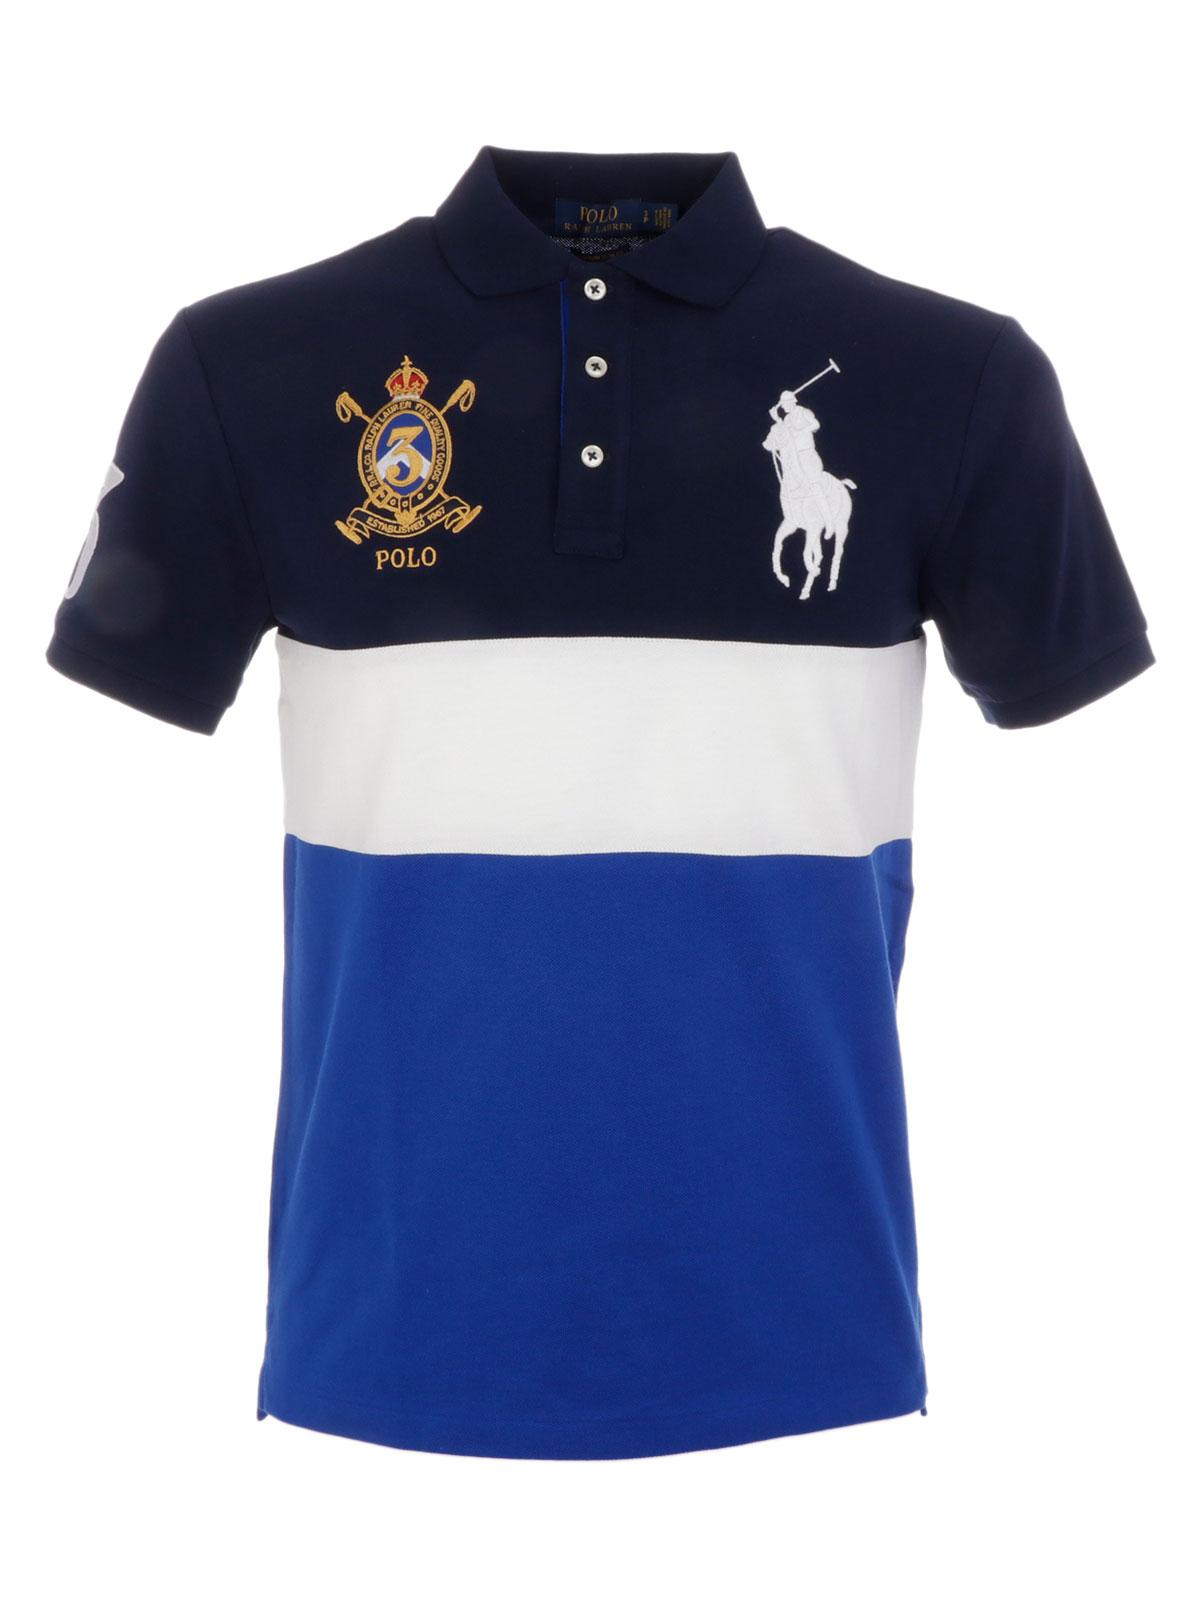 c2190423 POLO RALPH LAUREN Men's Striped Polo Shirt Blue-Mu | 710694701001 ...